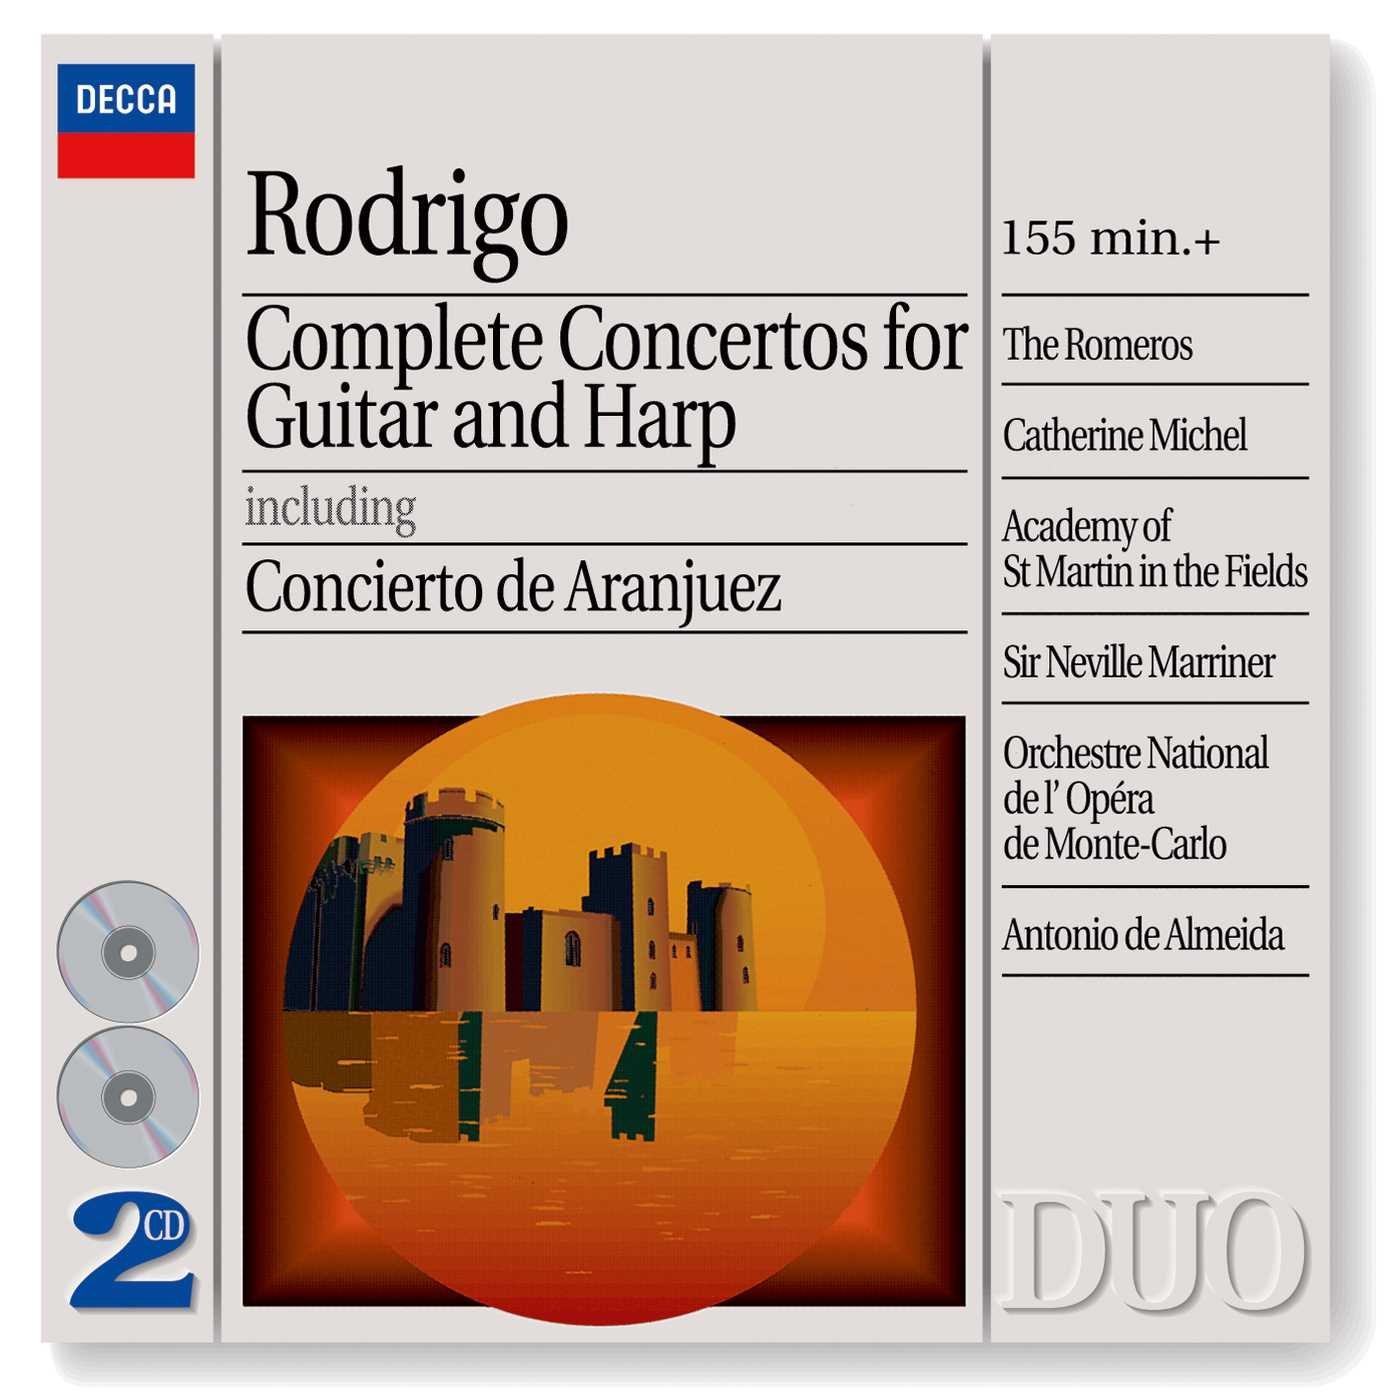 Rodrigo: Complete Concertos for Guitar and Harp incl. Concierto de Aranjuez